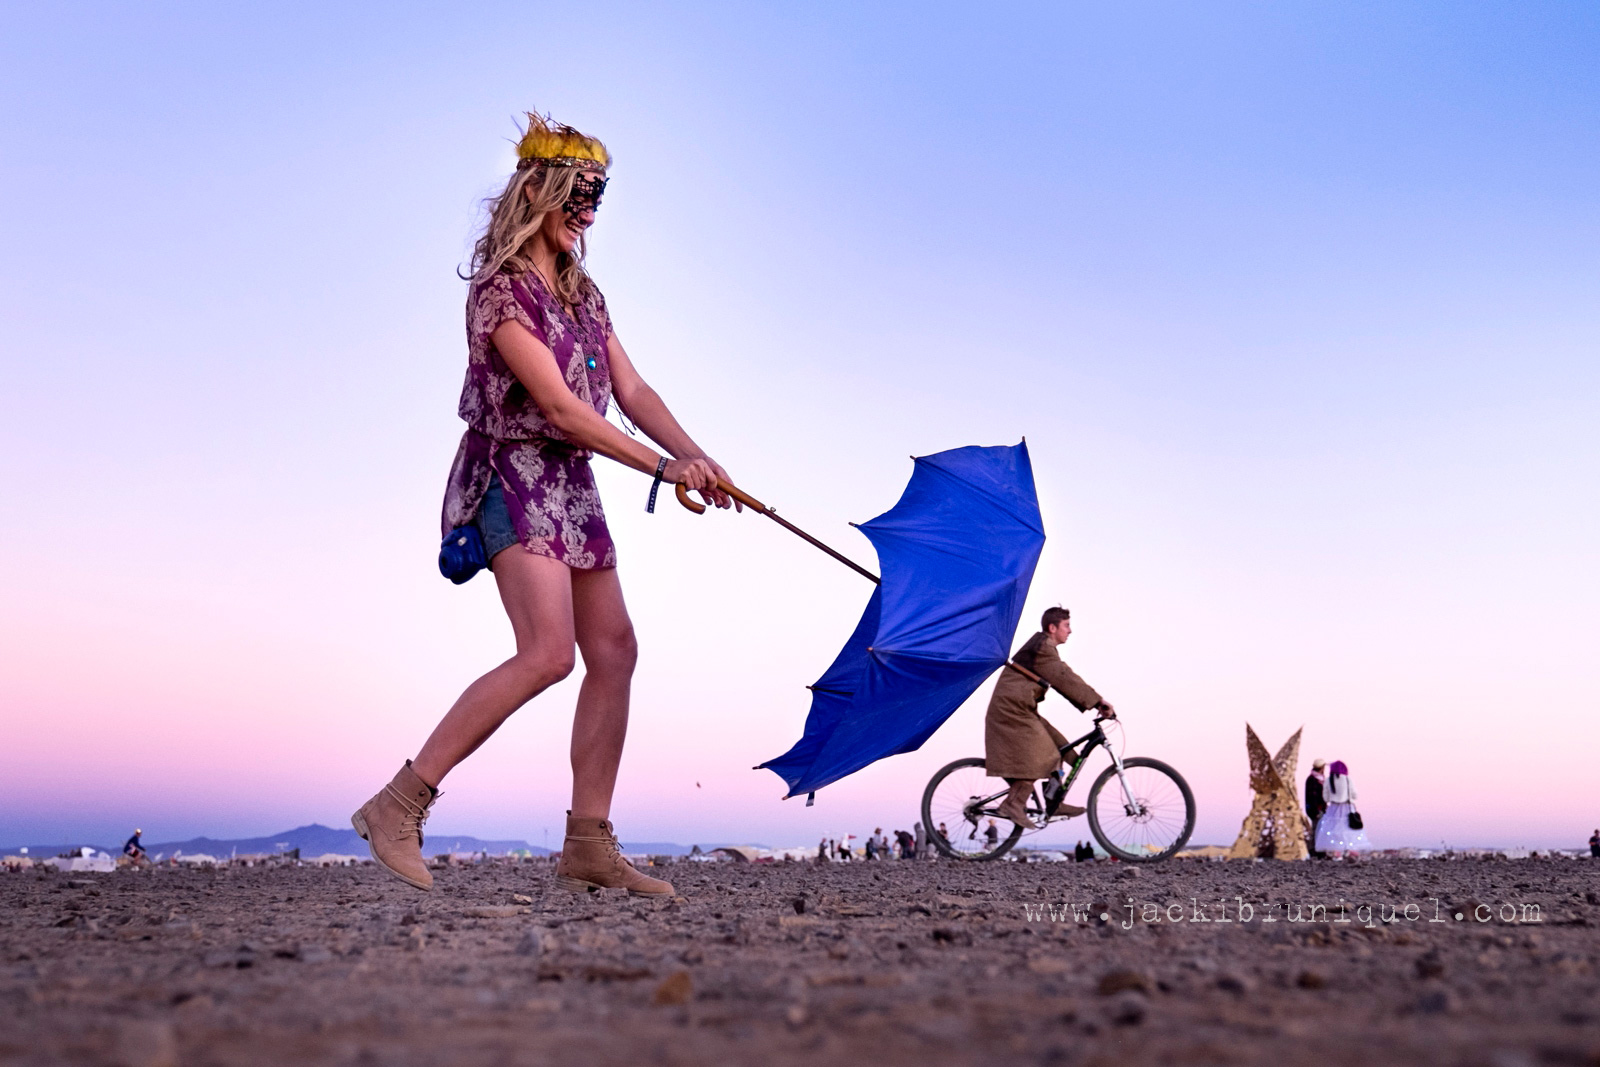 Afrika-Burn-2016-Creative-South-African-Photographer-Jacki-Bruniquel-033.jpg